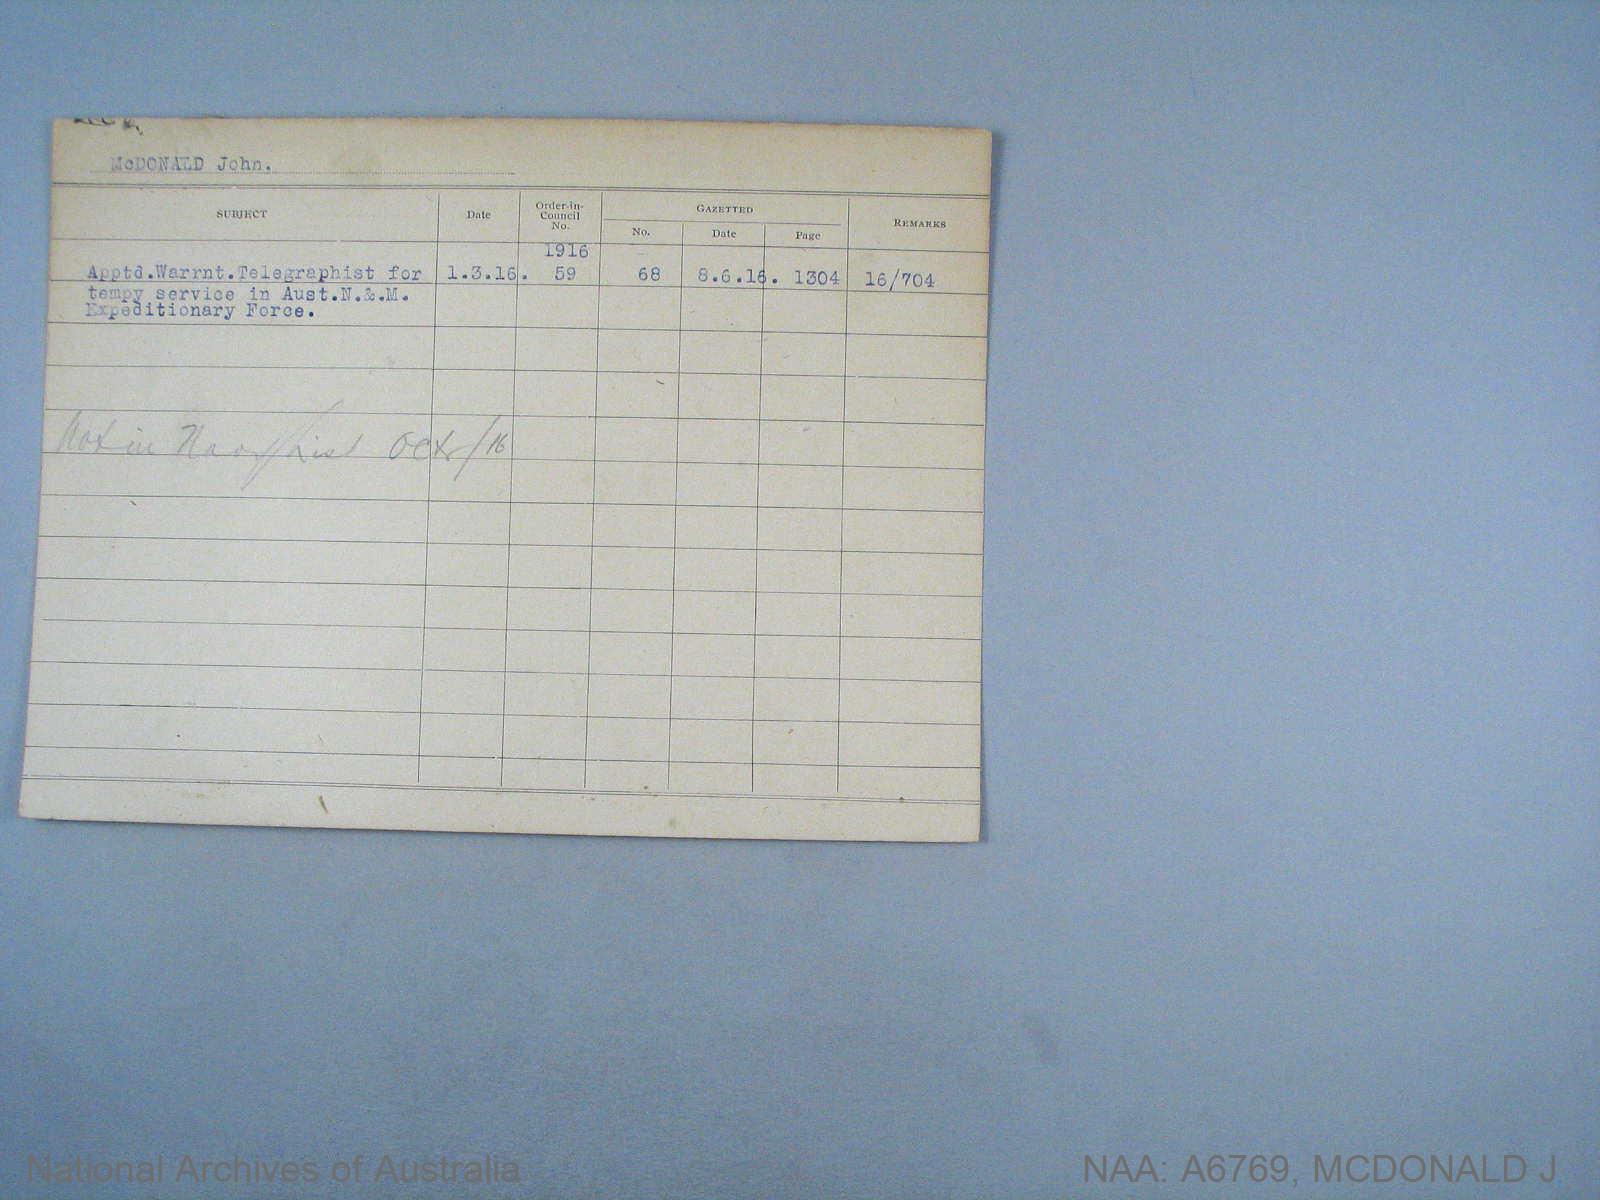 MCDONALD JOHN : Date of birth - 19 Nov 1900 : Place of birth - MANCHESTER ENGLAND : Place of enlistment - SYDNEY : Next of Kin - ELLALINE